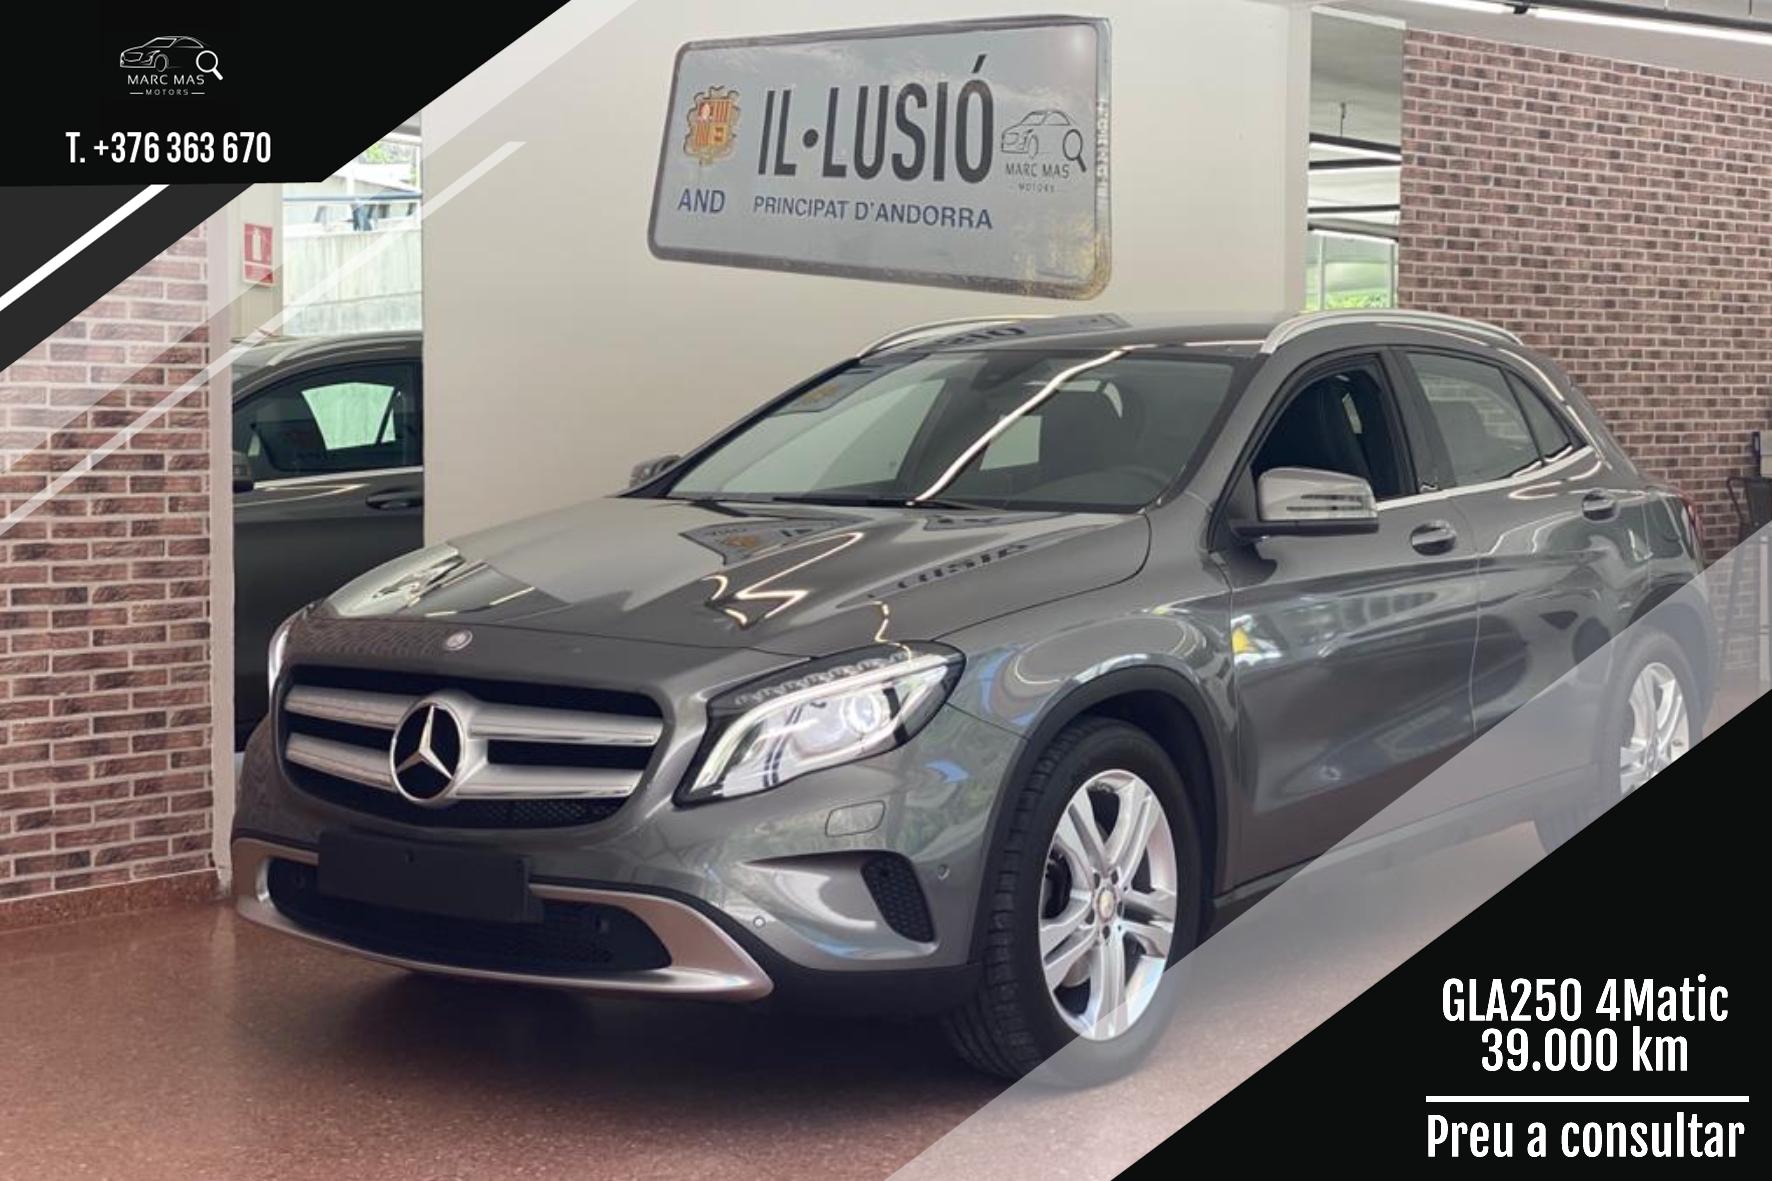 Mercedes-Benz - GLA 250 4Matic - GLA 250 4MATIC GLA 250 4MATIC Benzina  2016  39.000 Km